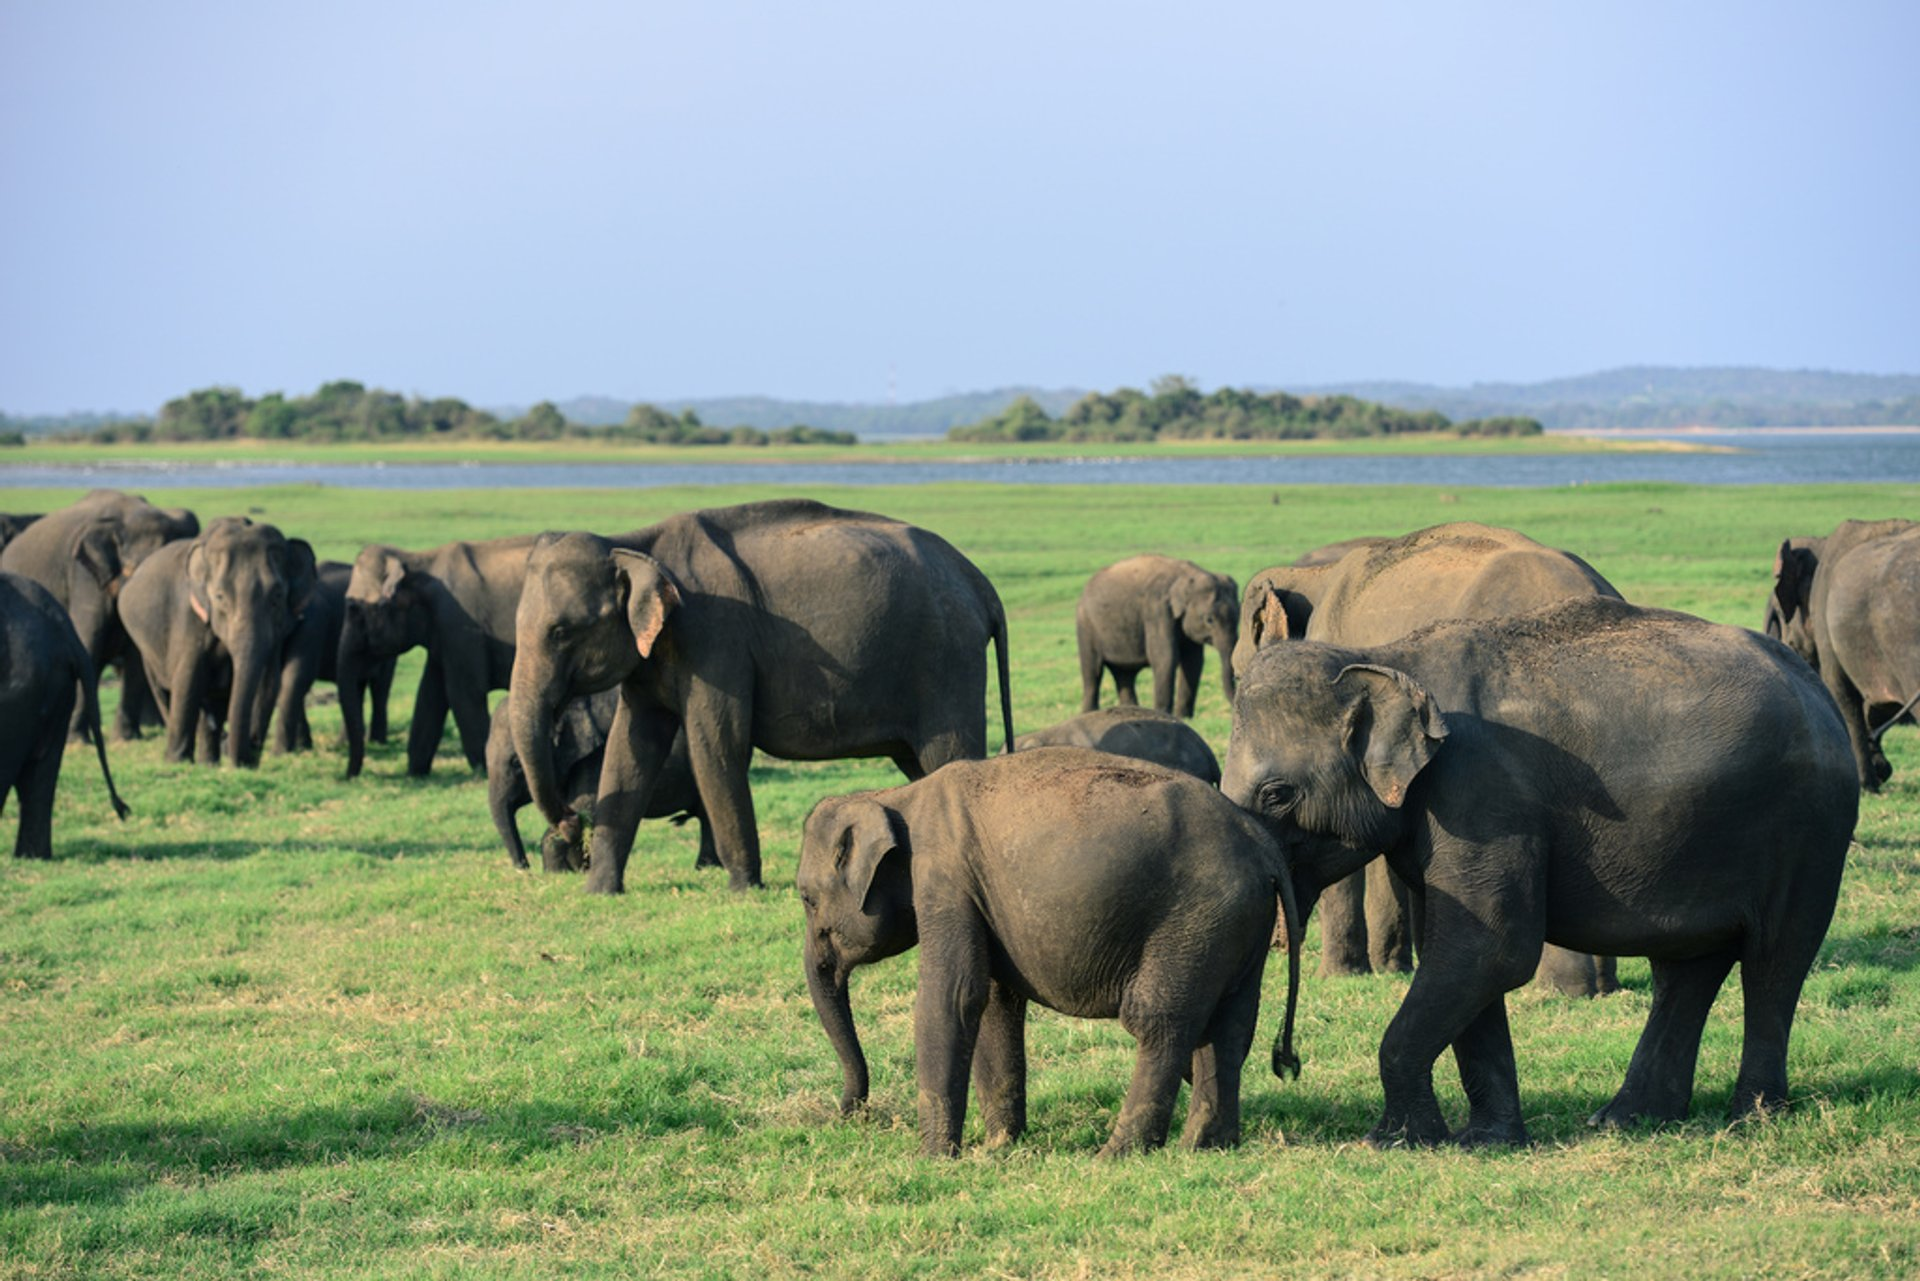 Elephant Gathering in Sri Lanka - Best Time